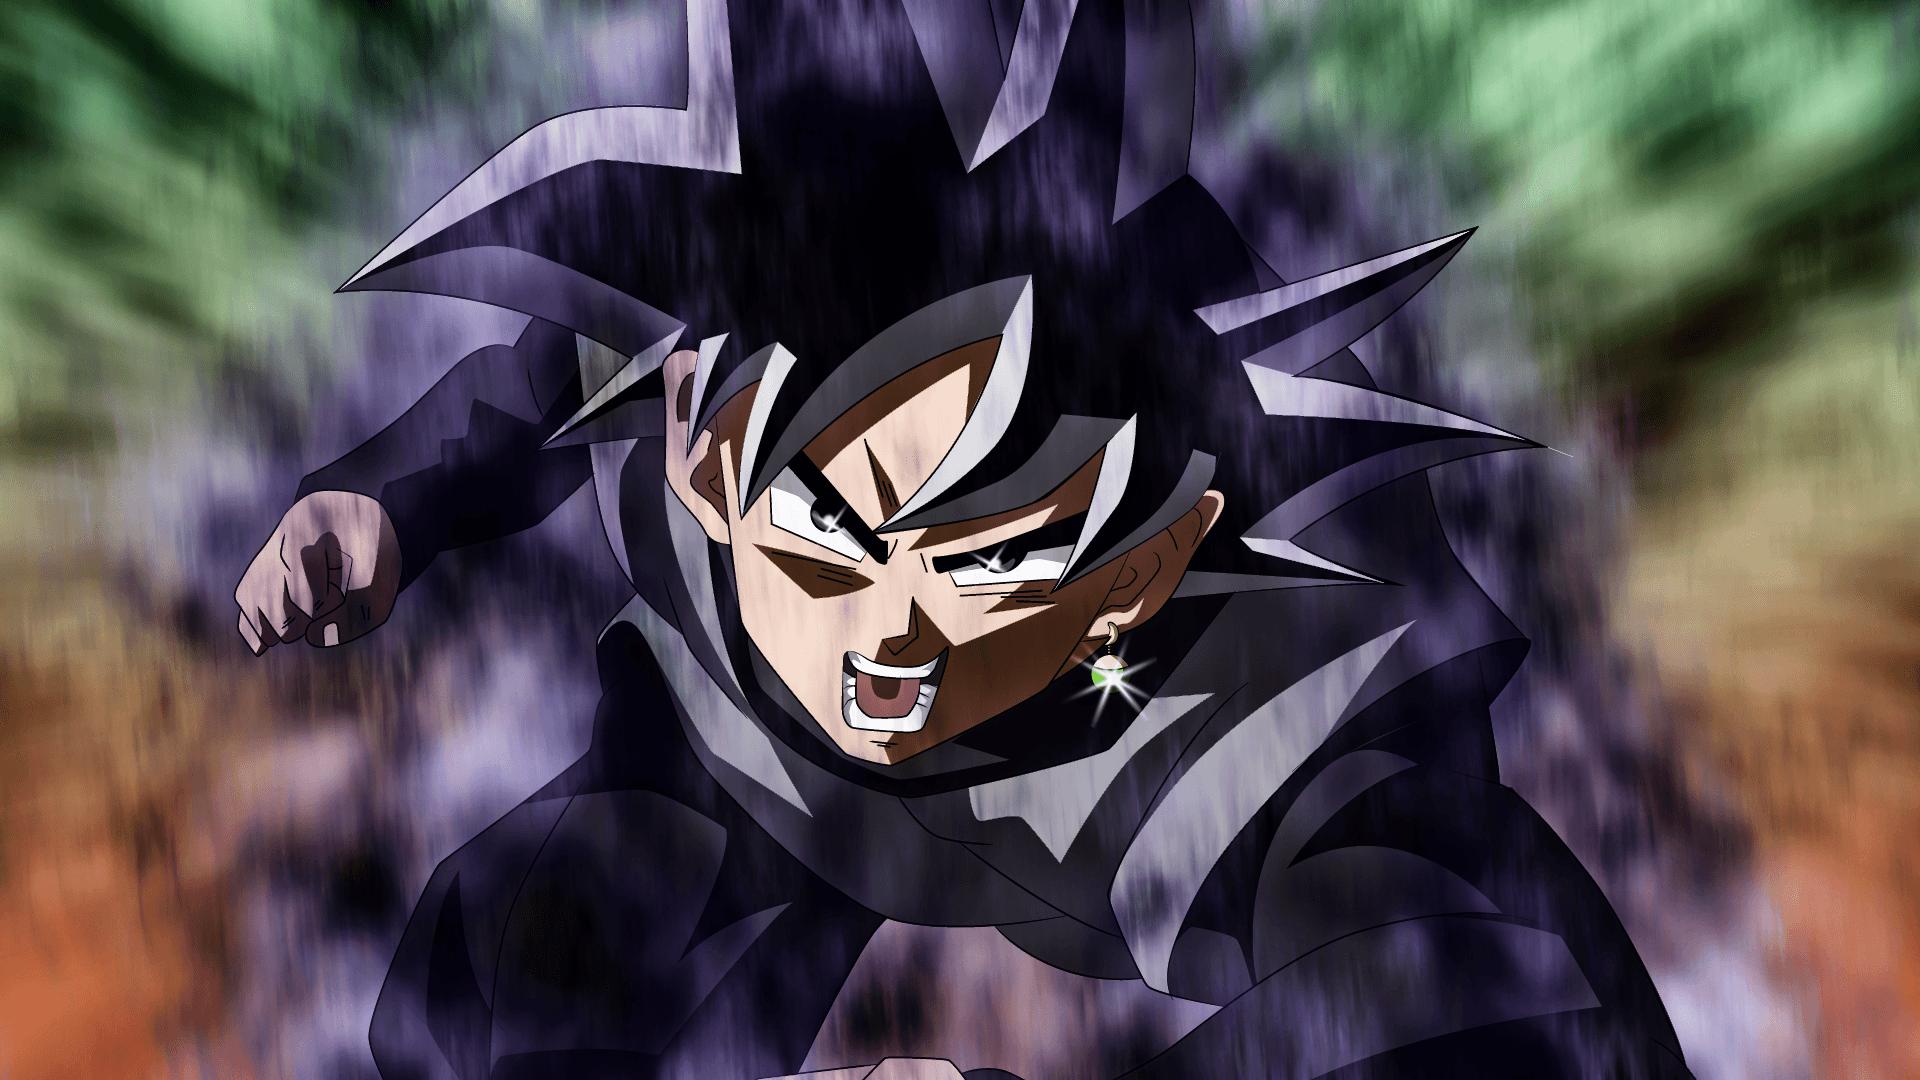 Goku Black Wallpapers - Wallpaper Cave